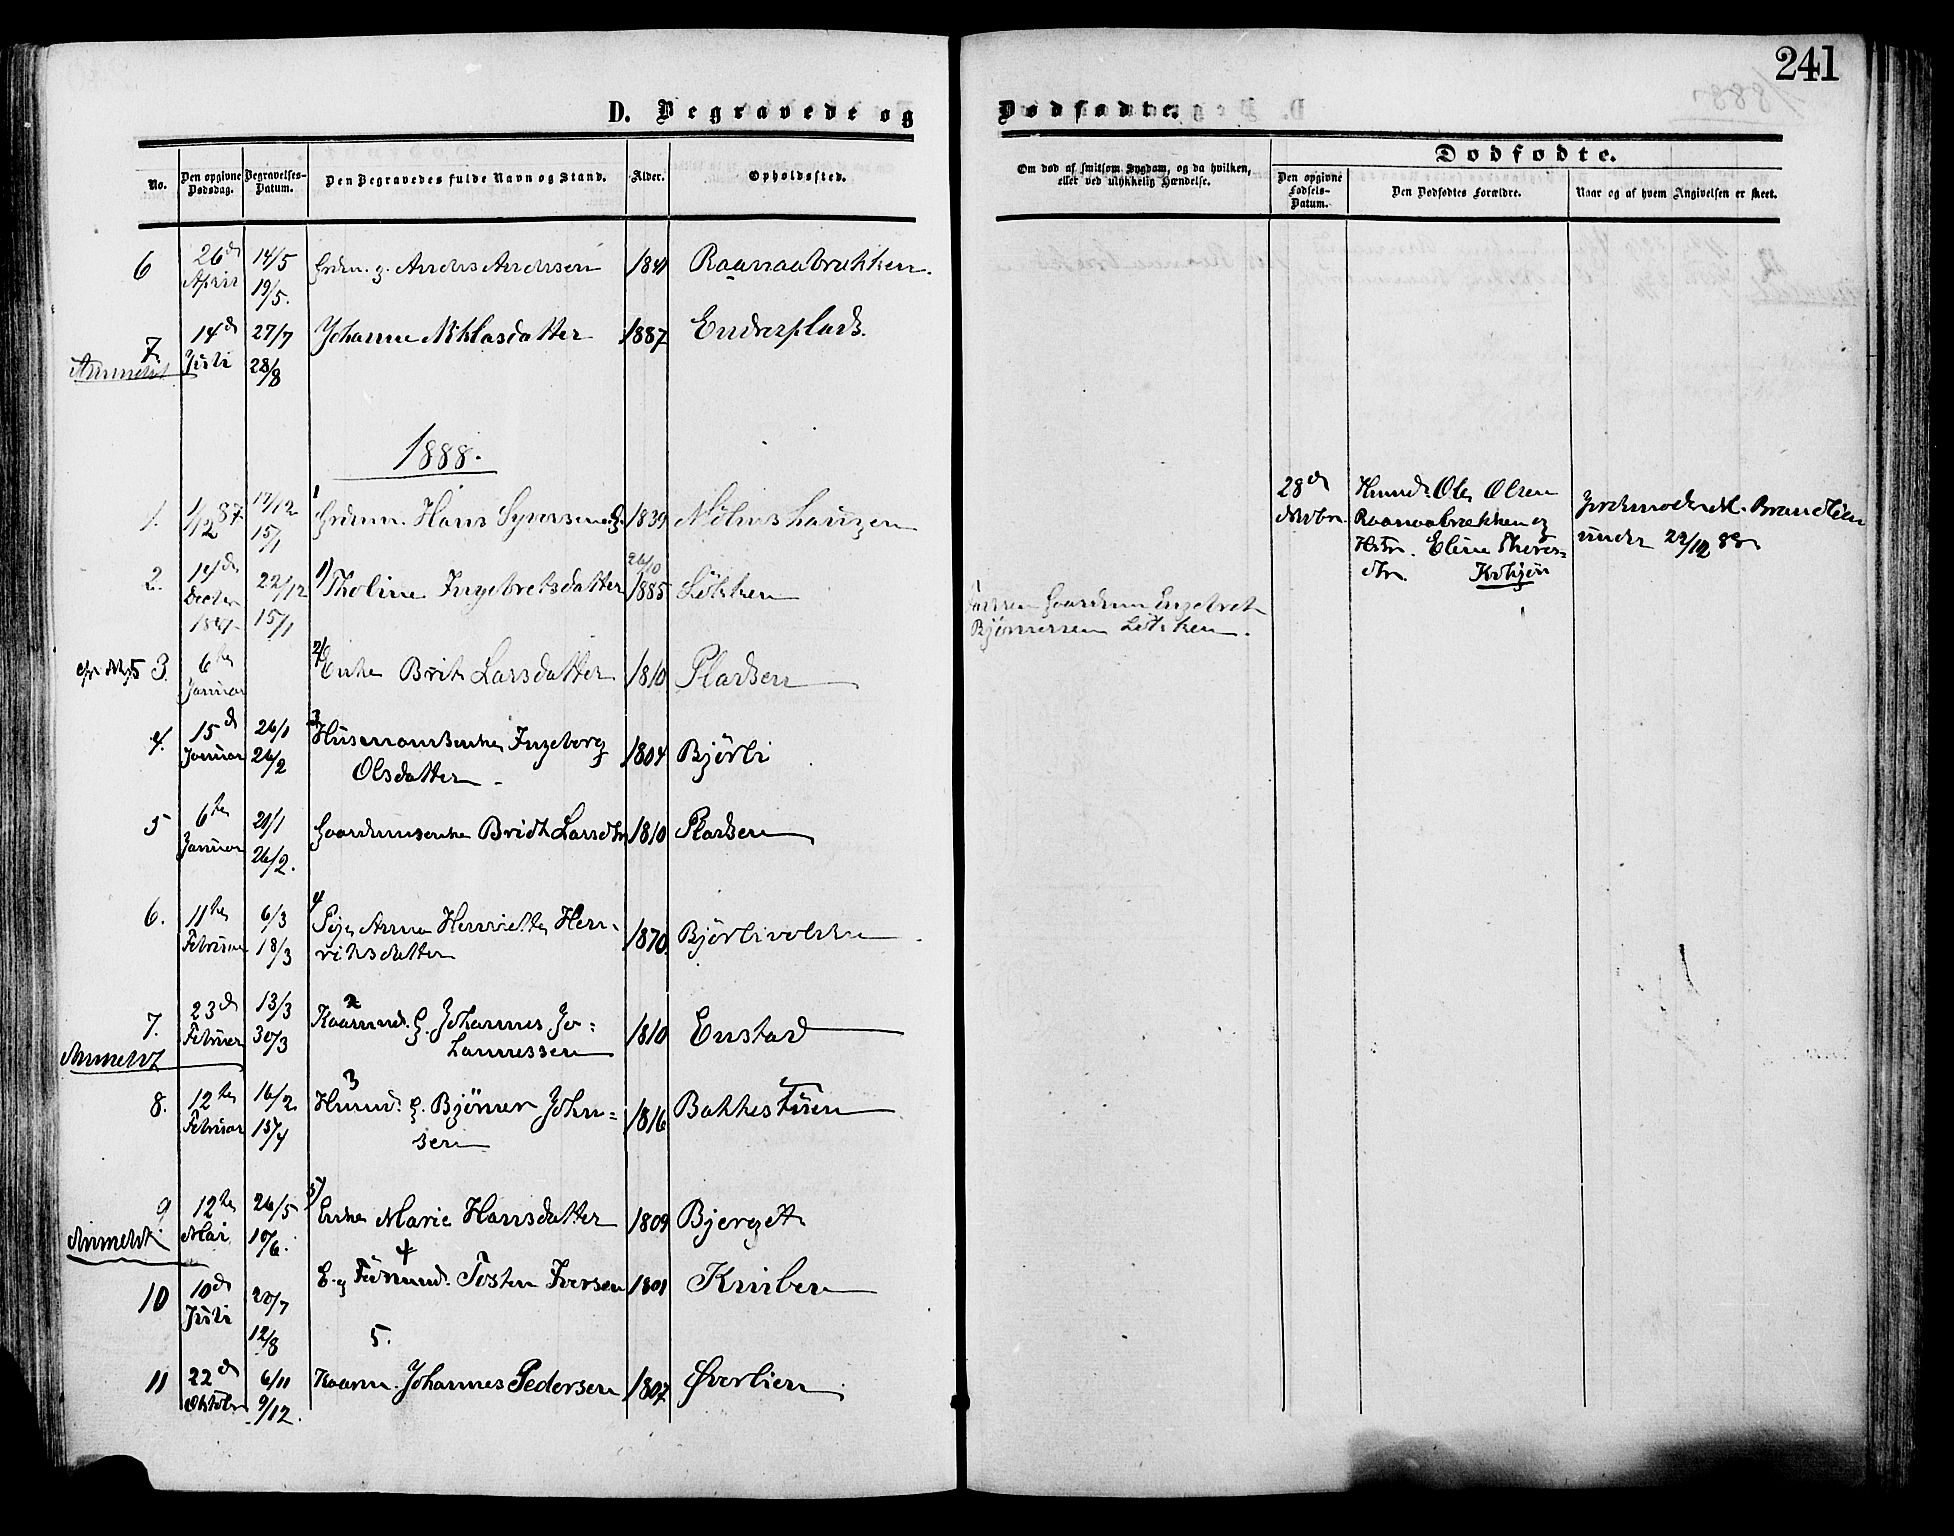 SAH, Lesja prestekontor, Ministerialbok nr. 9, 1854-1889, s. 241